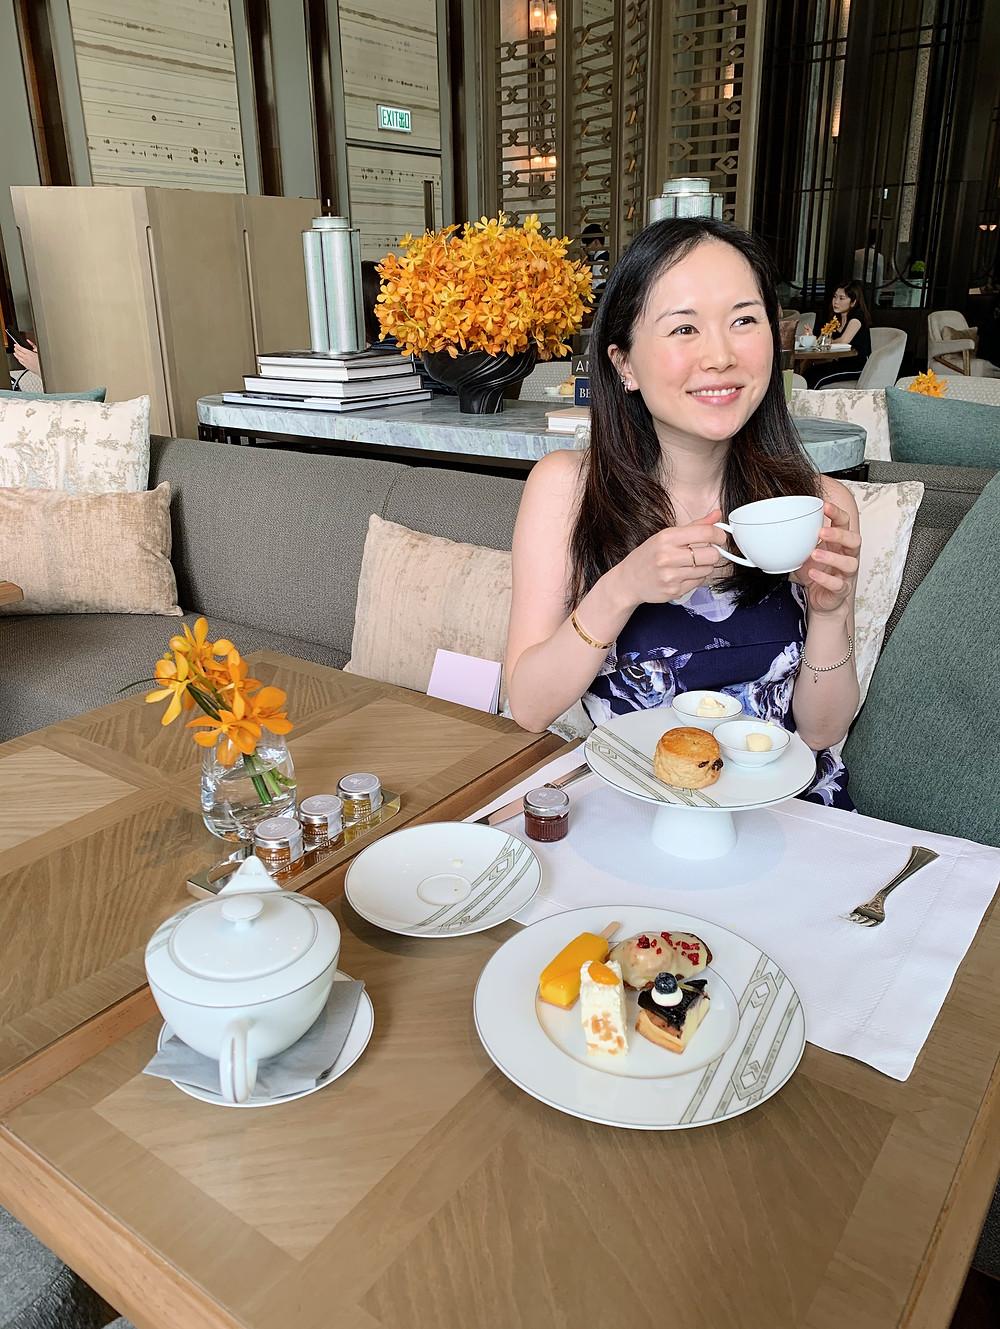 Jenni Lien Christian Blogger The Yay Project at St Regis Hotel Hong Kong